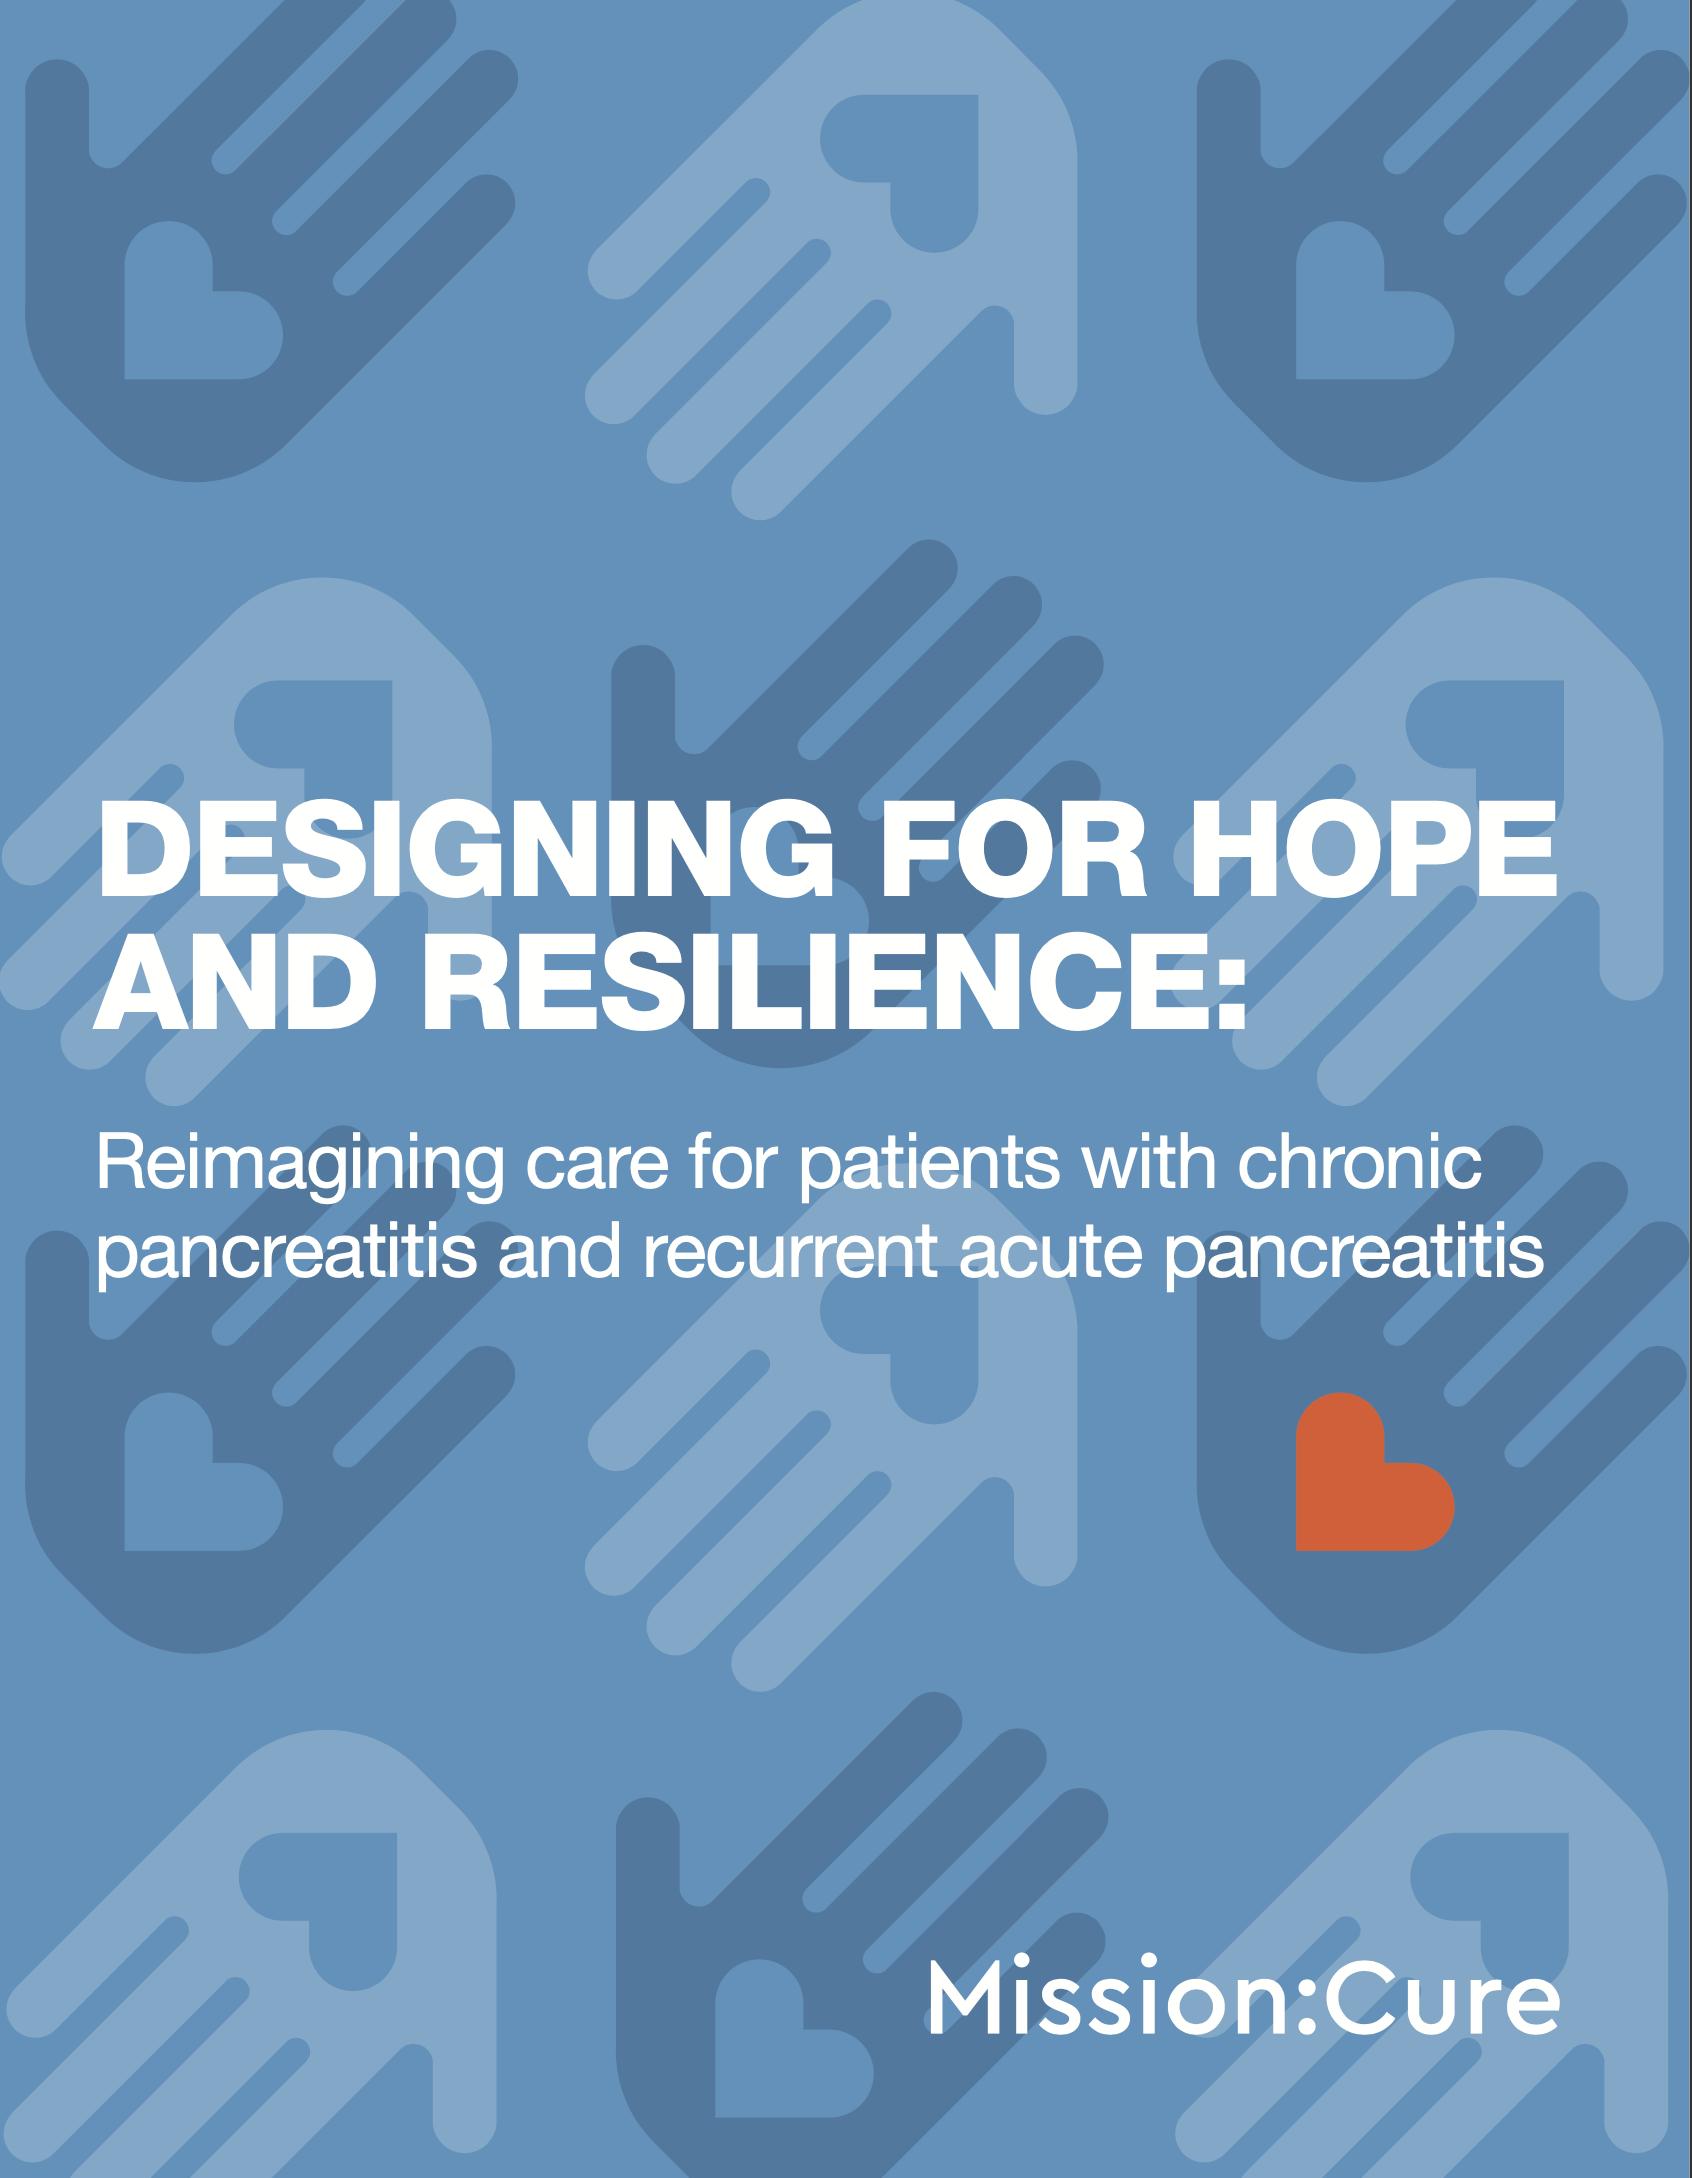 Patient-Centered Pancreatitis Care